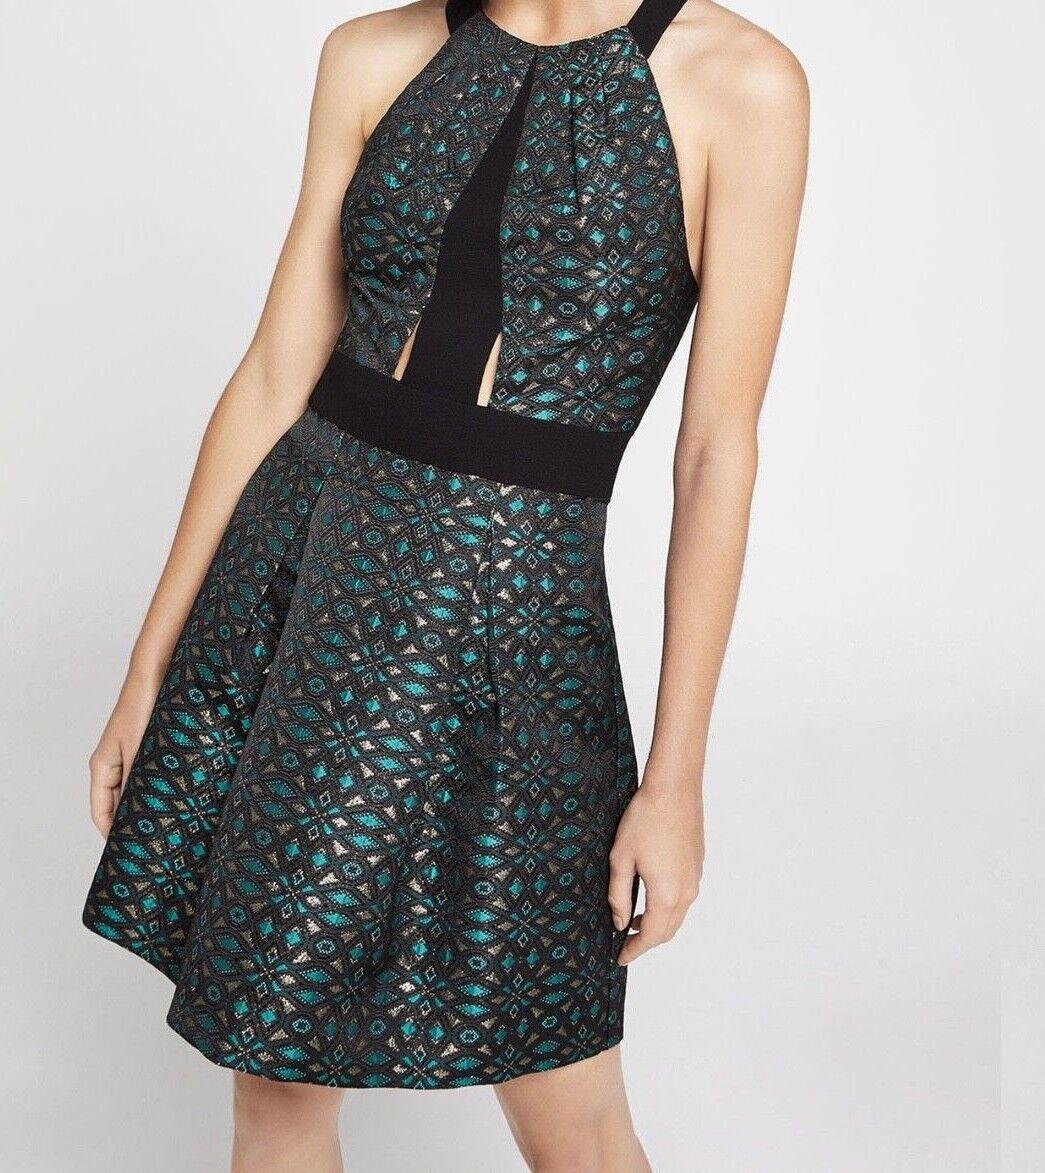 NEW damen's Bcbgeneration Metallic Jacquard Halter Dress SZ 2 Beautiful